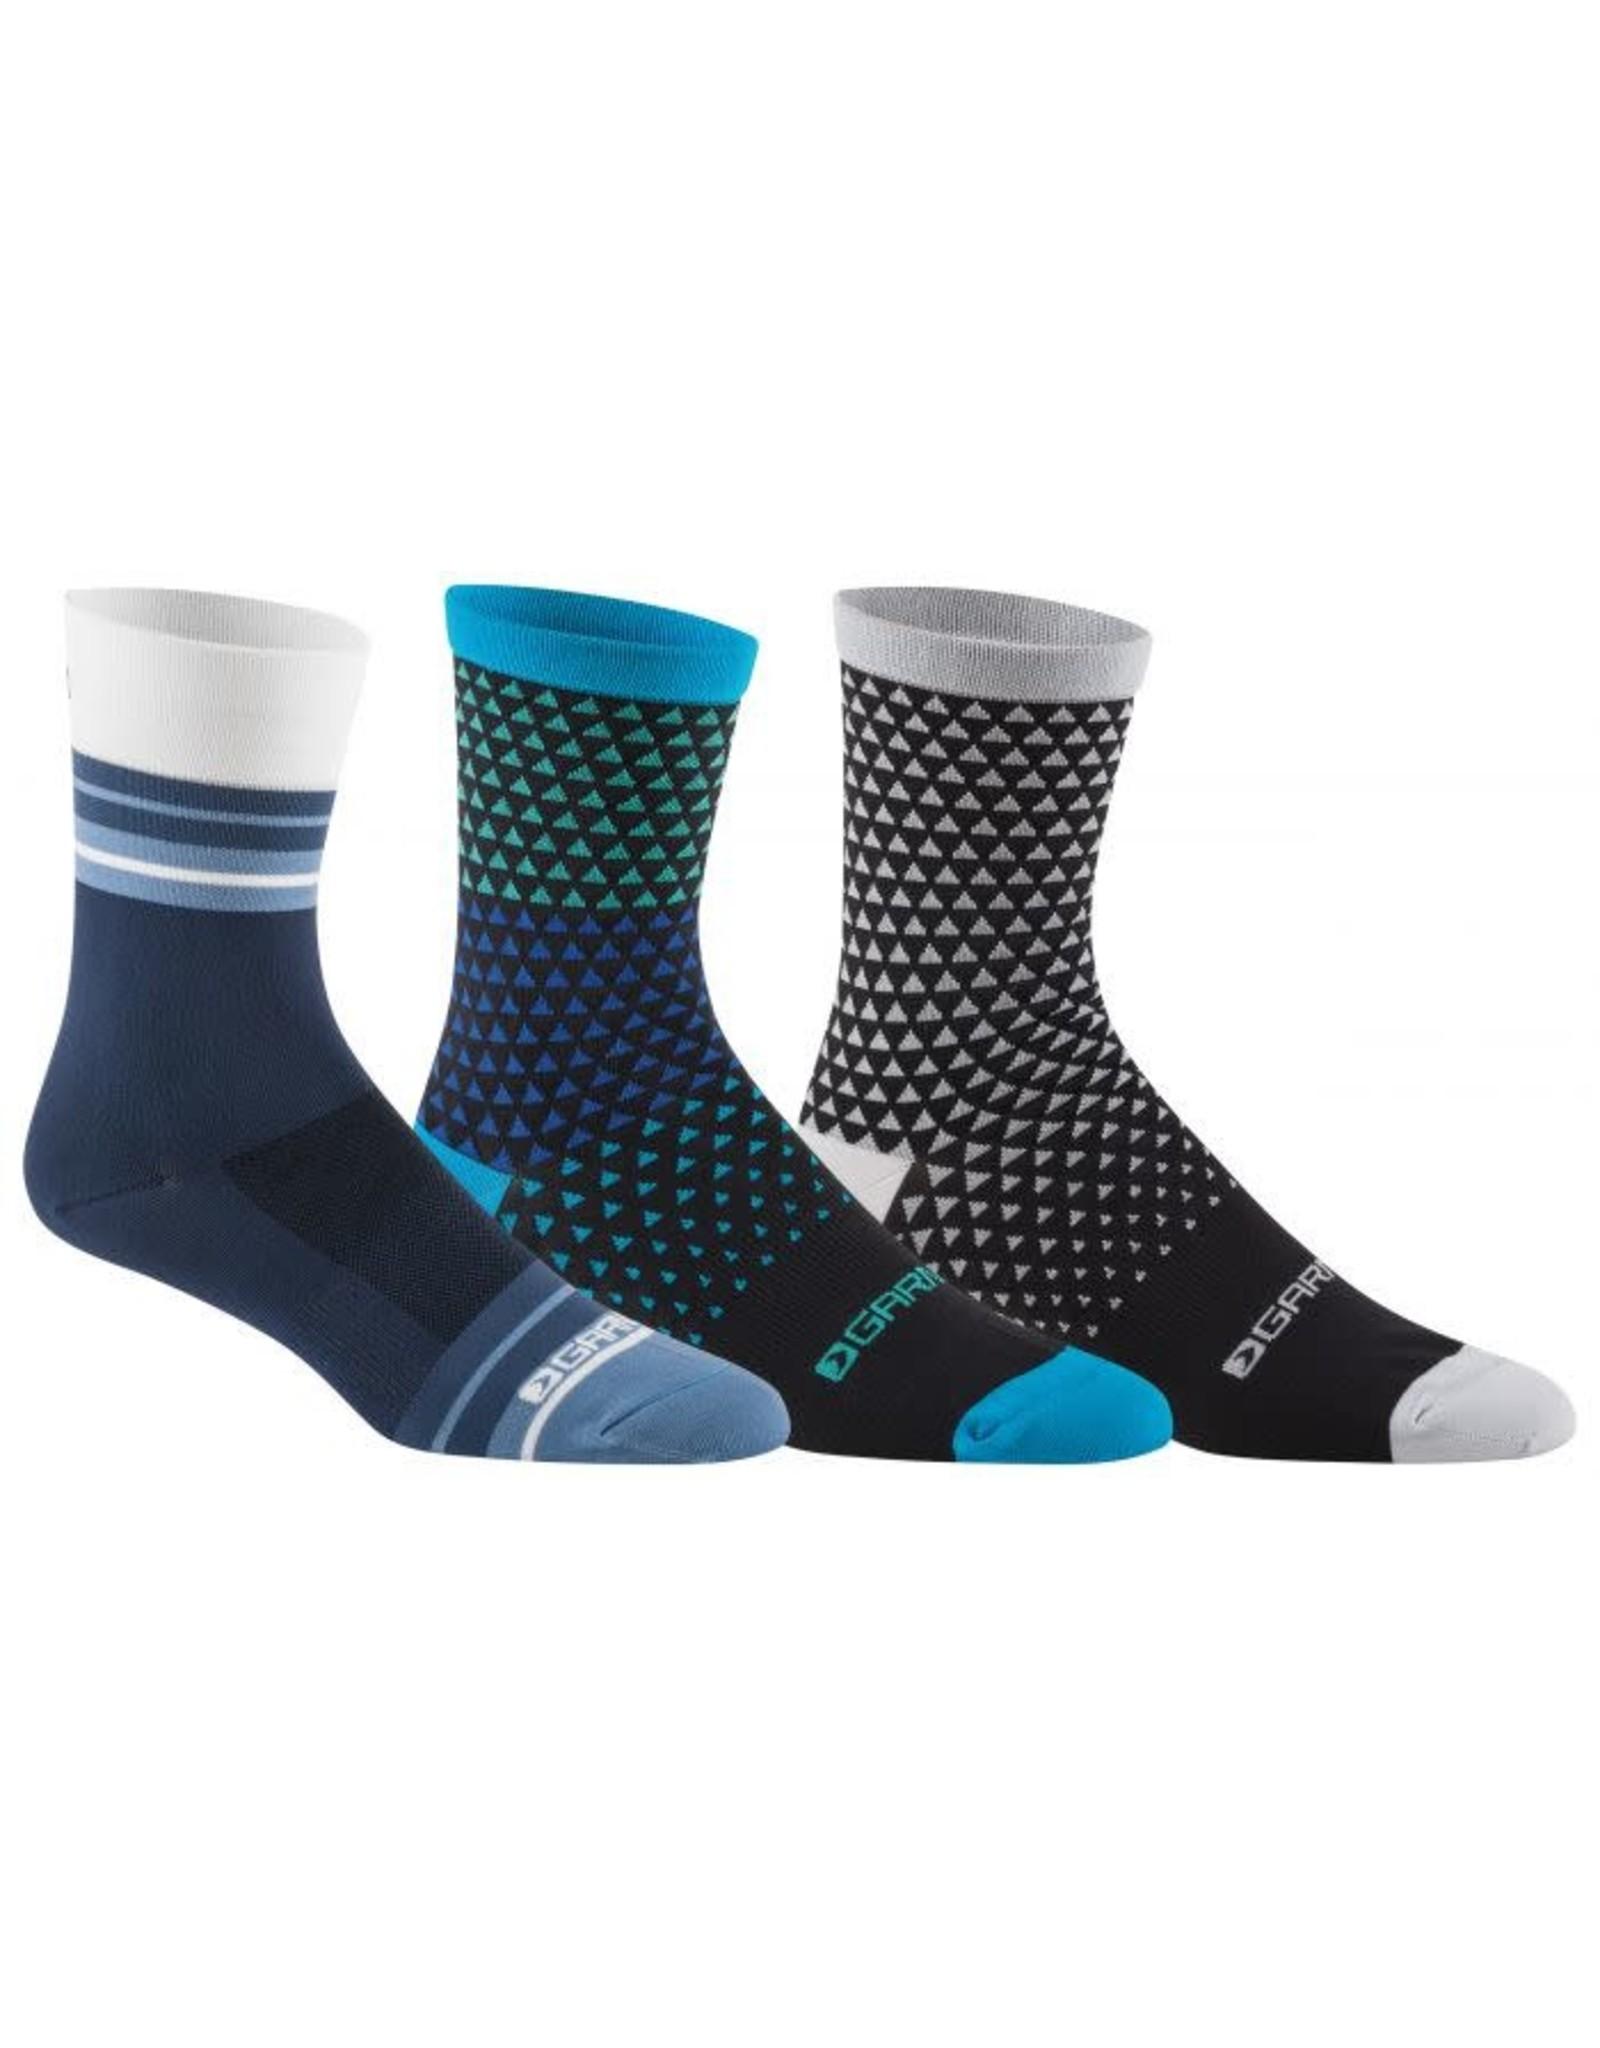 Garneau GARNEAU M Conti Long Socks (3-Pack) S19